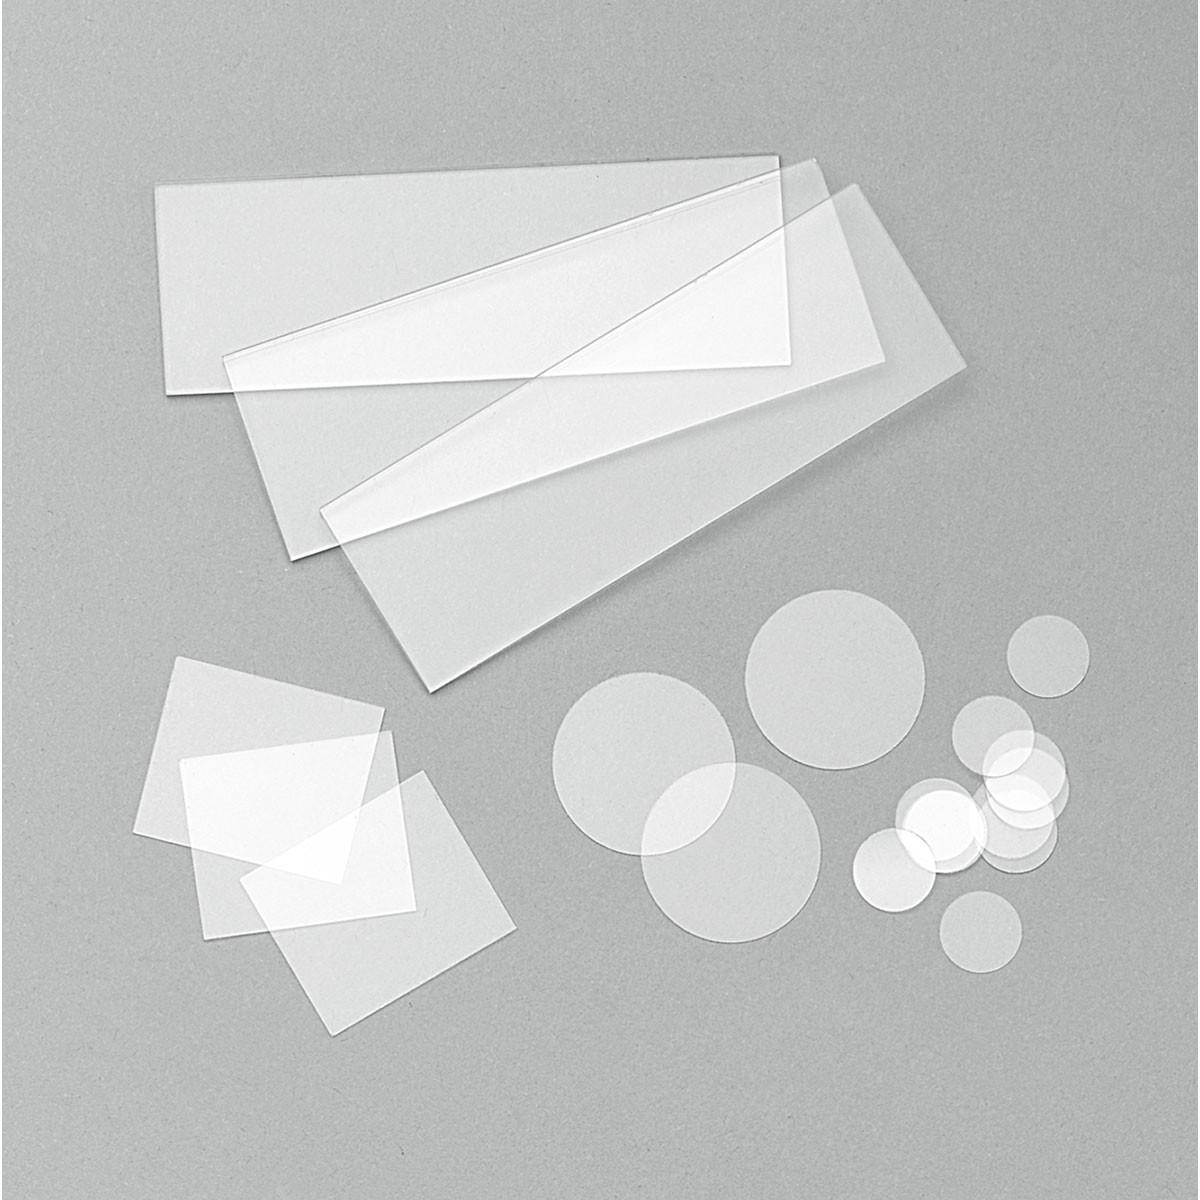 Microscope Slides 76x52mm, 1.0-1.2, plain (50)